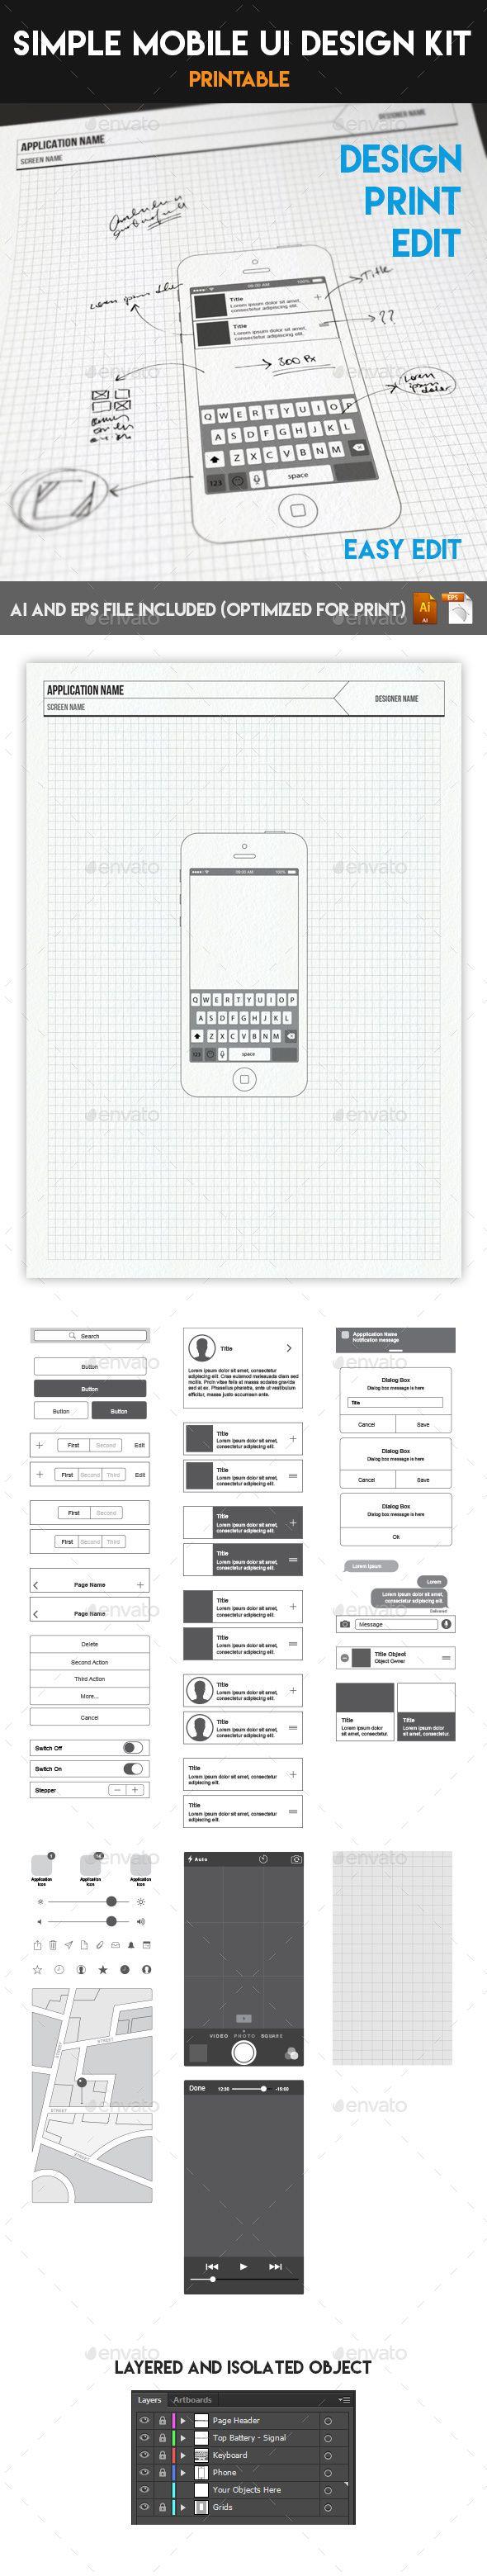 Simple Mobile UI Wireframe Design Kit (Print & Edit)